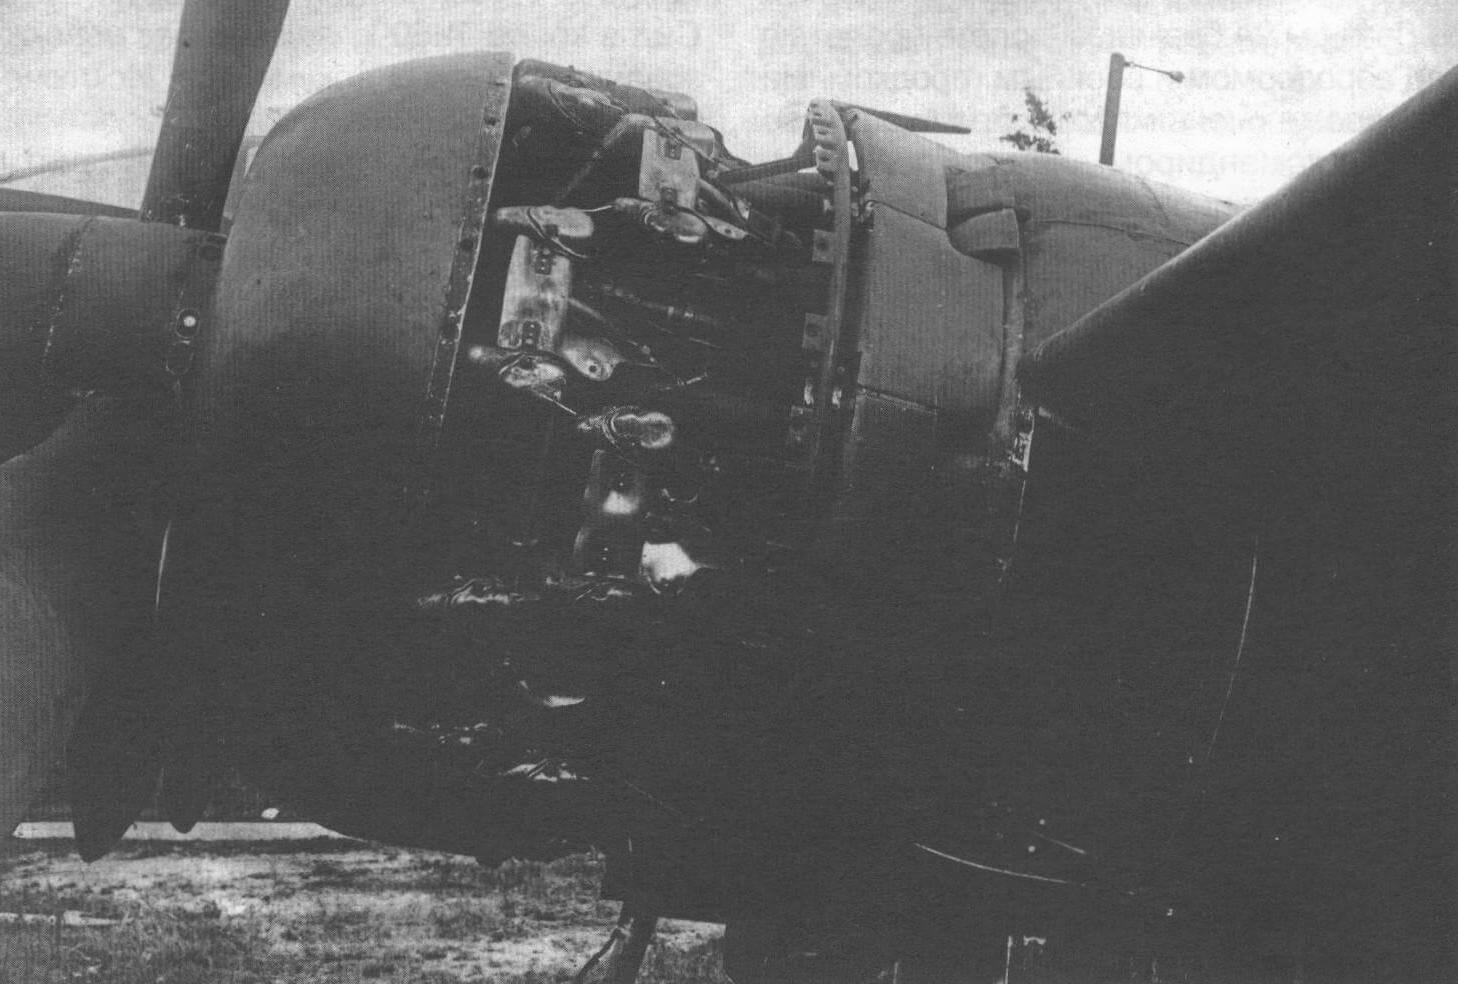 Двигатель НА-112 самолета Ки-46-III